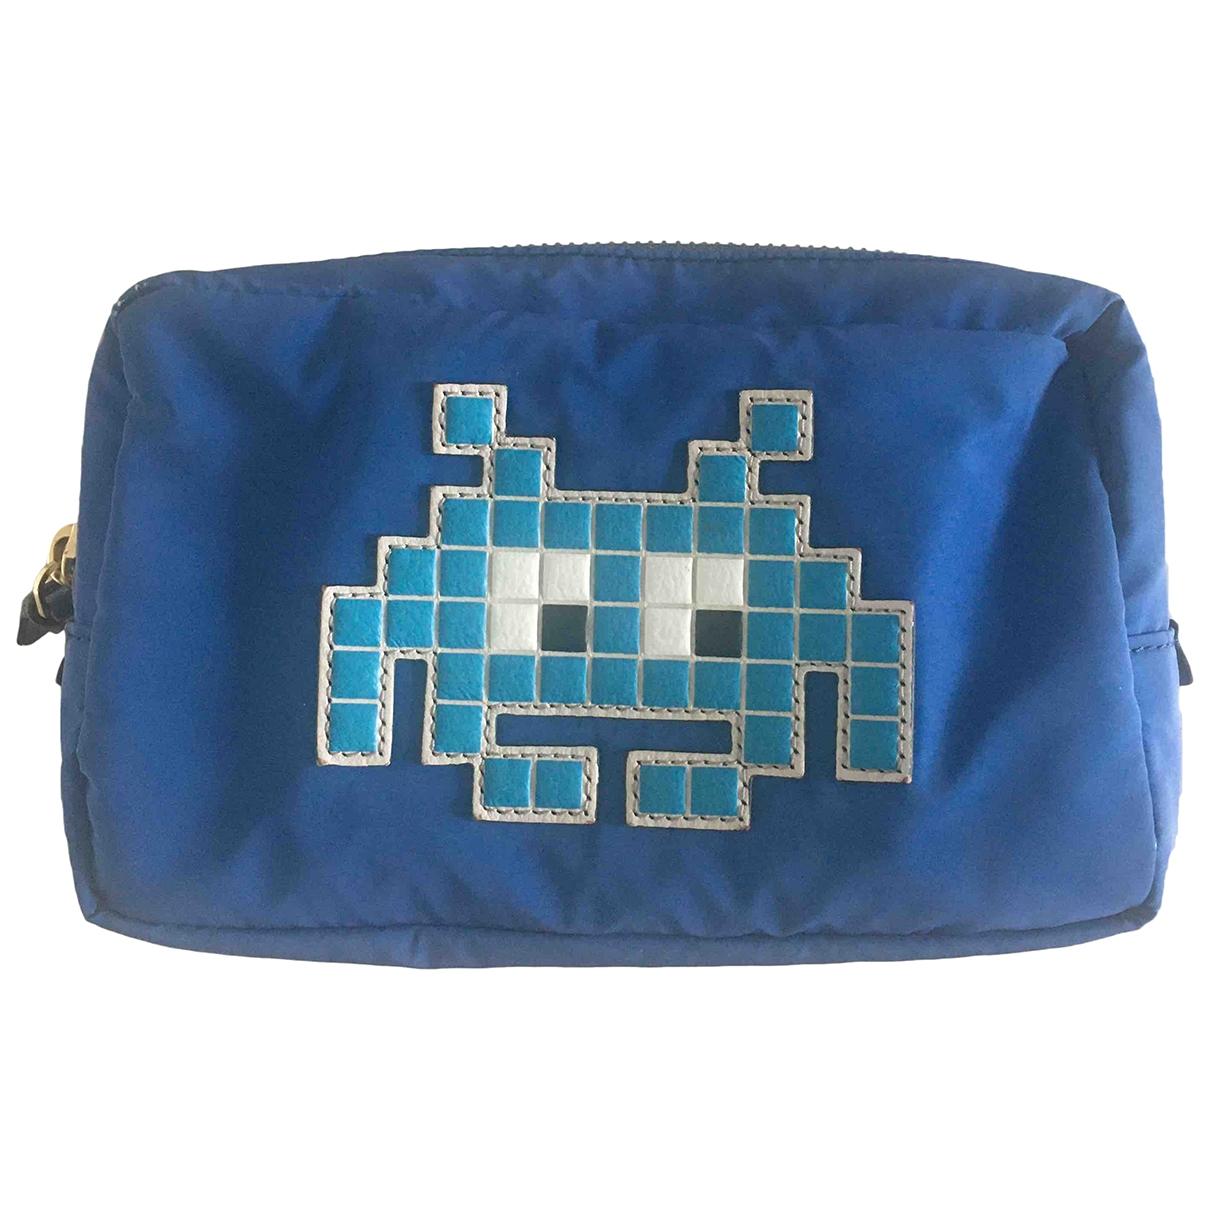 Anya Hindmarch \N Blue Purses, wallet & cases for Women \N